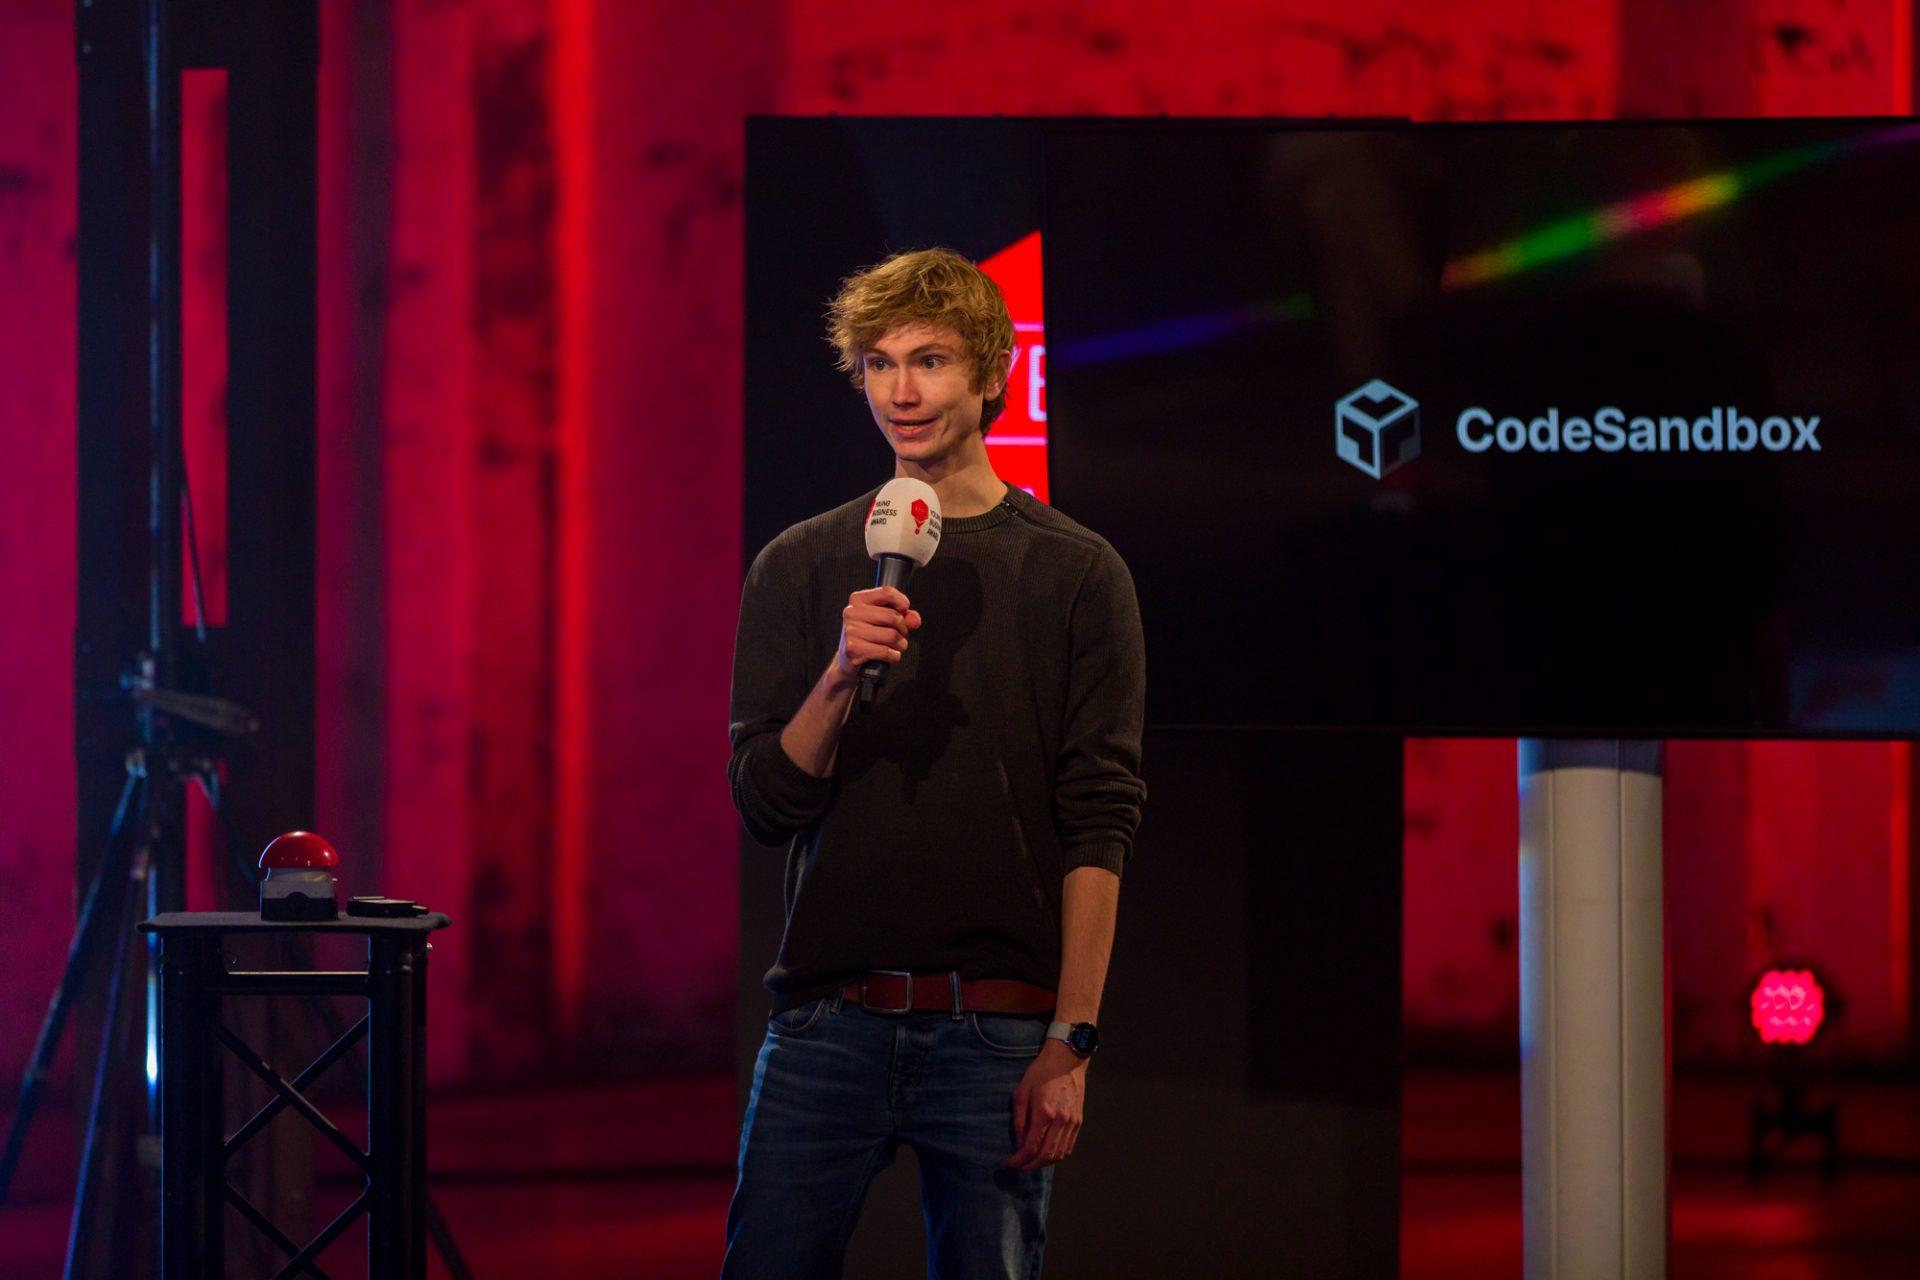 Bas Buursma founder Codesandbox